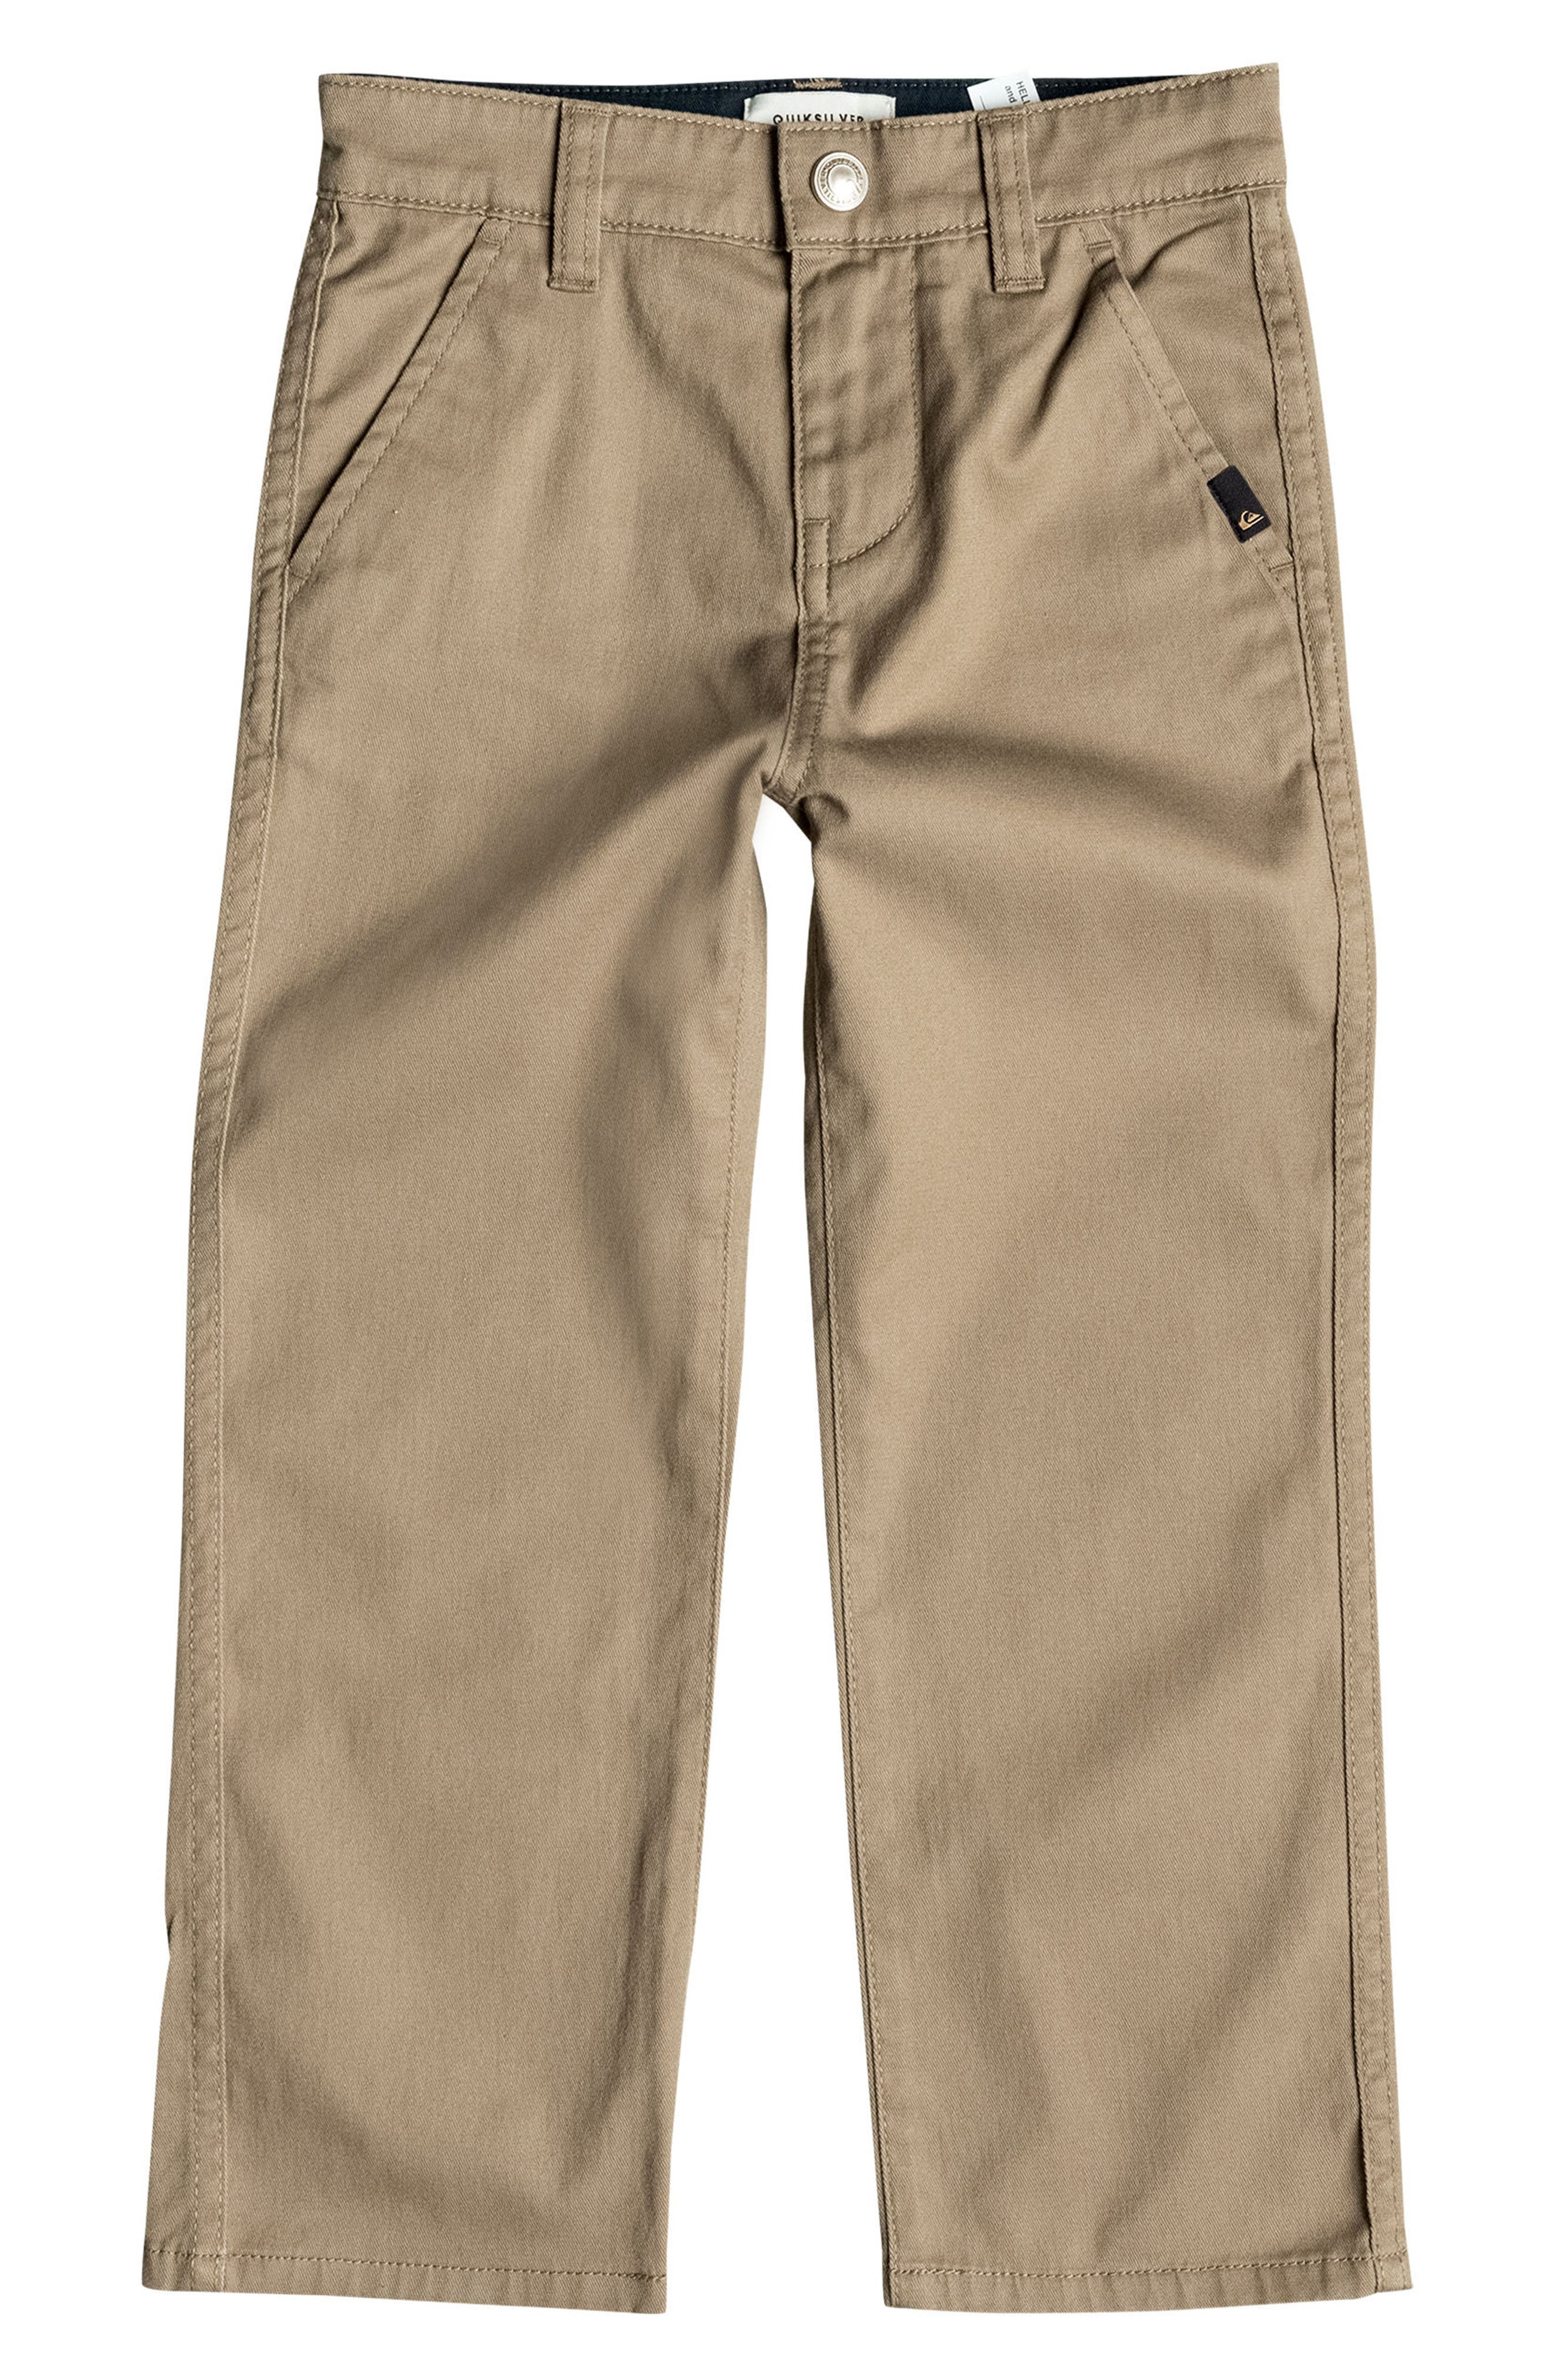 Quiksilver Everyday Union Pants (Toddler Boys & Little Boys)